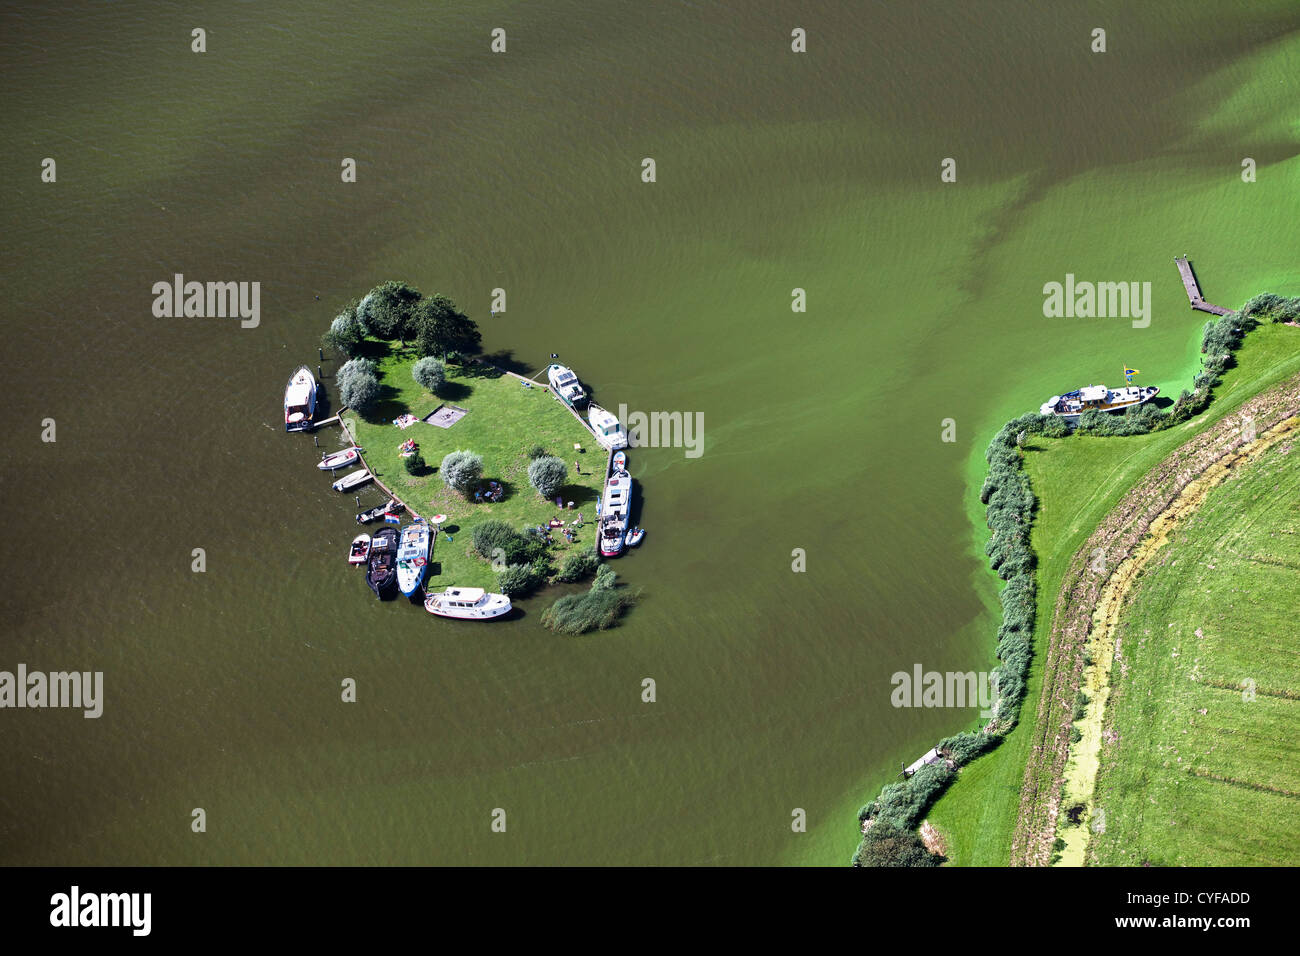 The Netherlands, Akersloot, lake called Alkmaardermeer. Yachts anchored near island. Aerial. - Stock Image